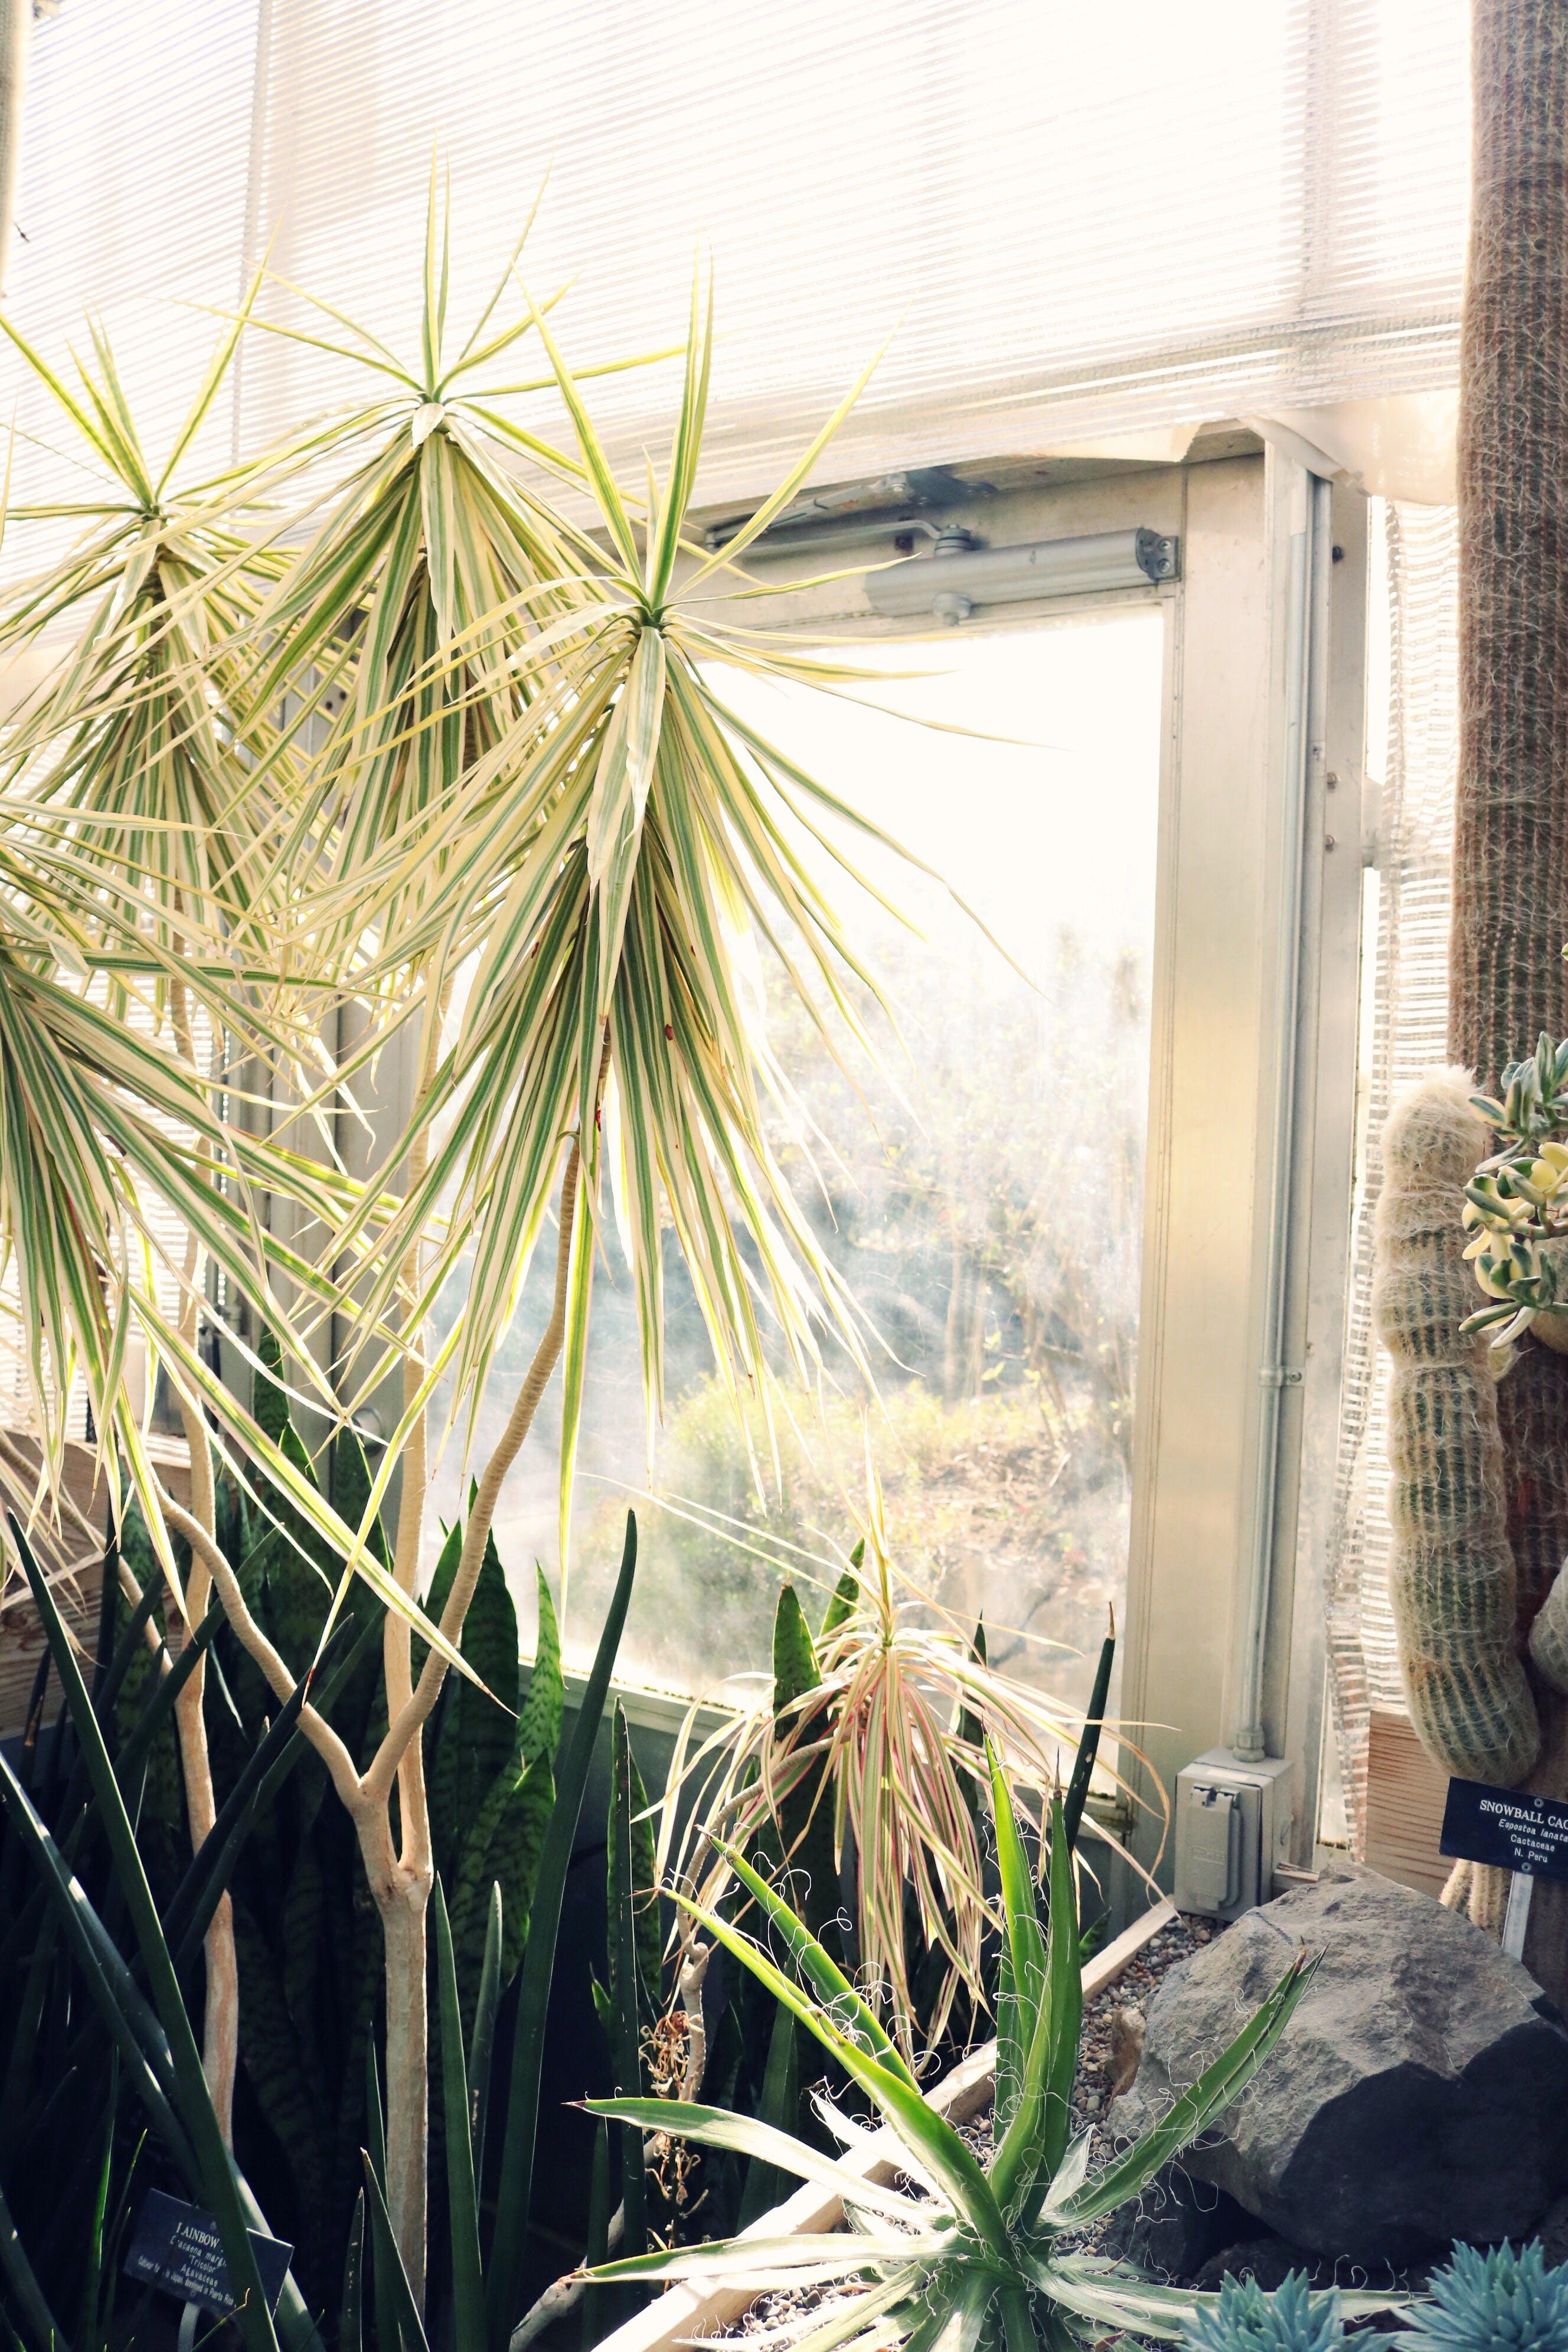 Yucca Plant Near Windowpane